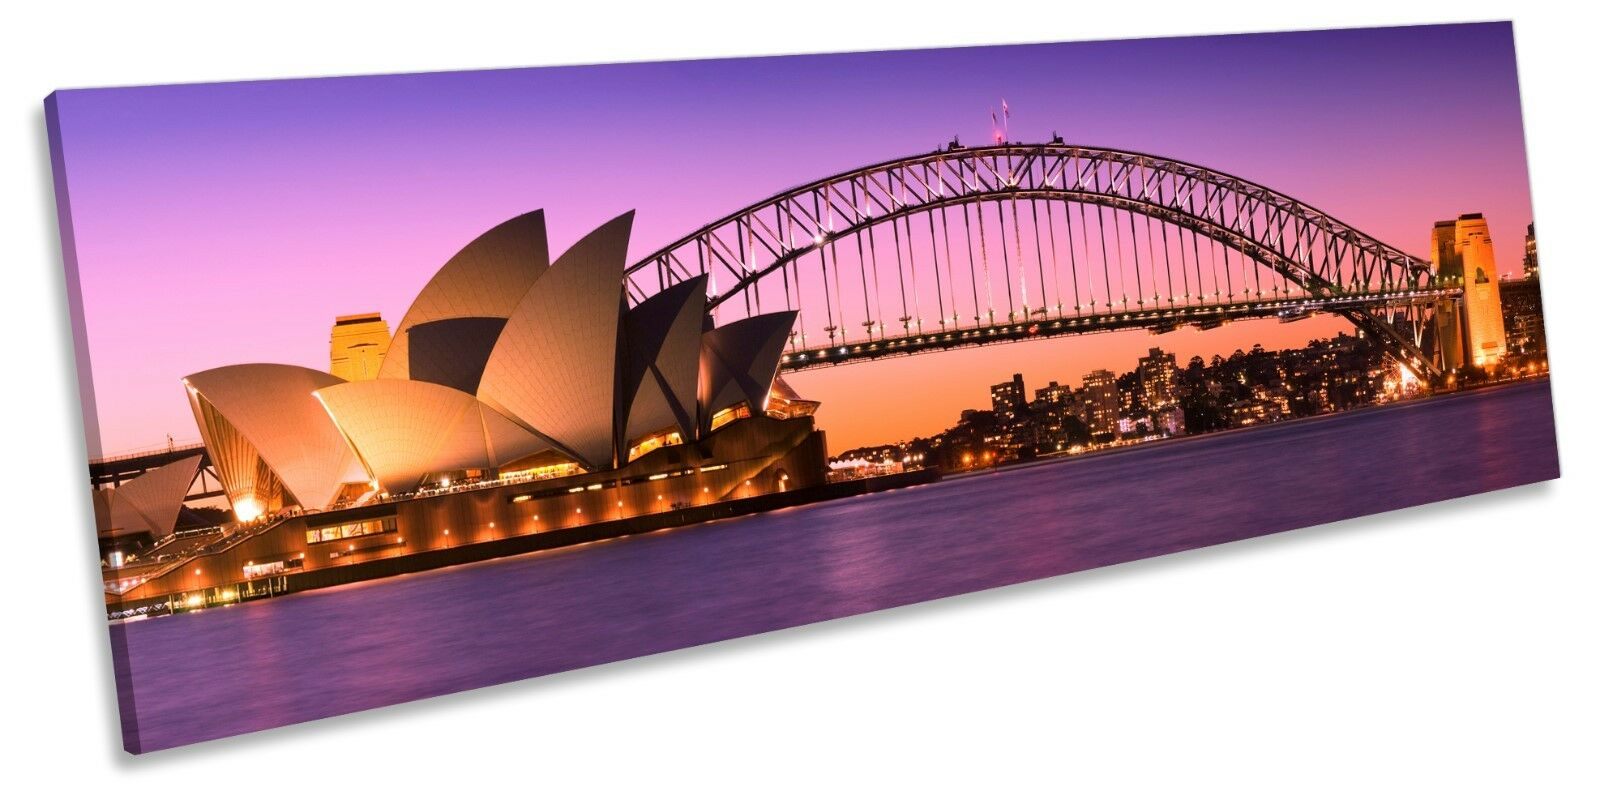 Sydney Harbour Skyline Città A MURO ARTE panoramico incorniciato incorniciato incorniciato stampa 006323